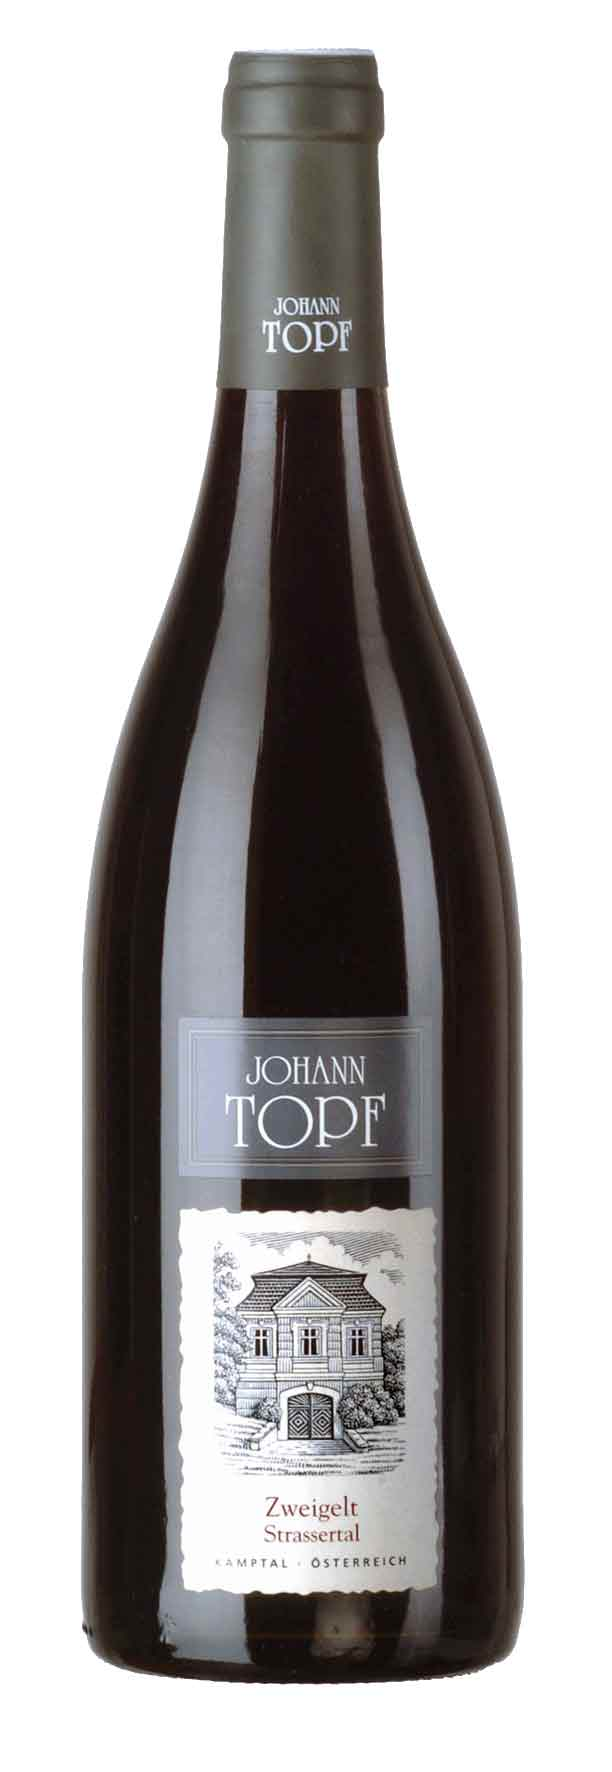 Zweigelt Strassertal Johann Topf  2013